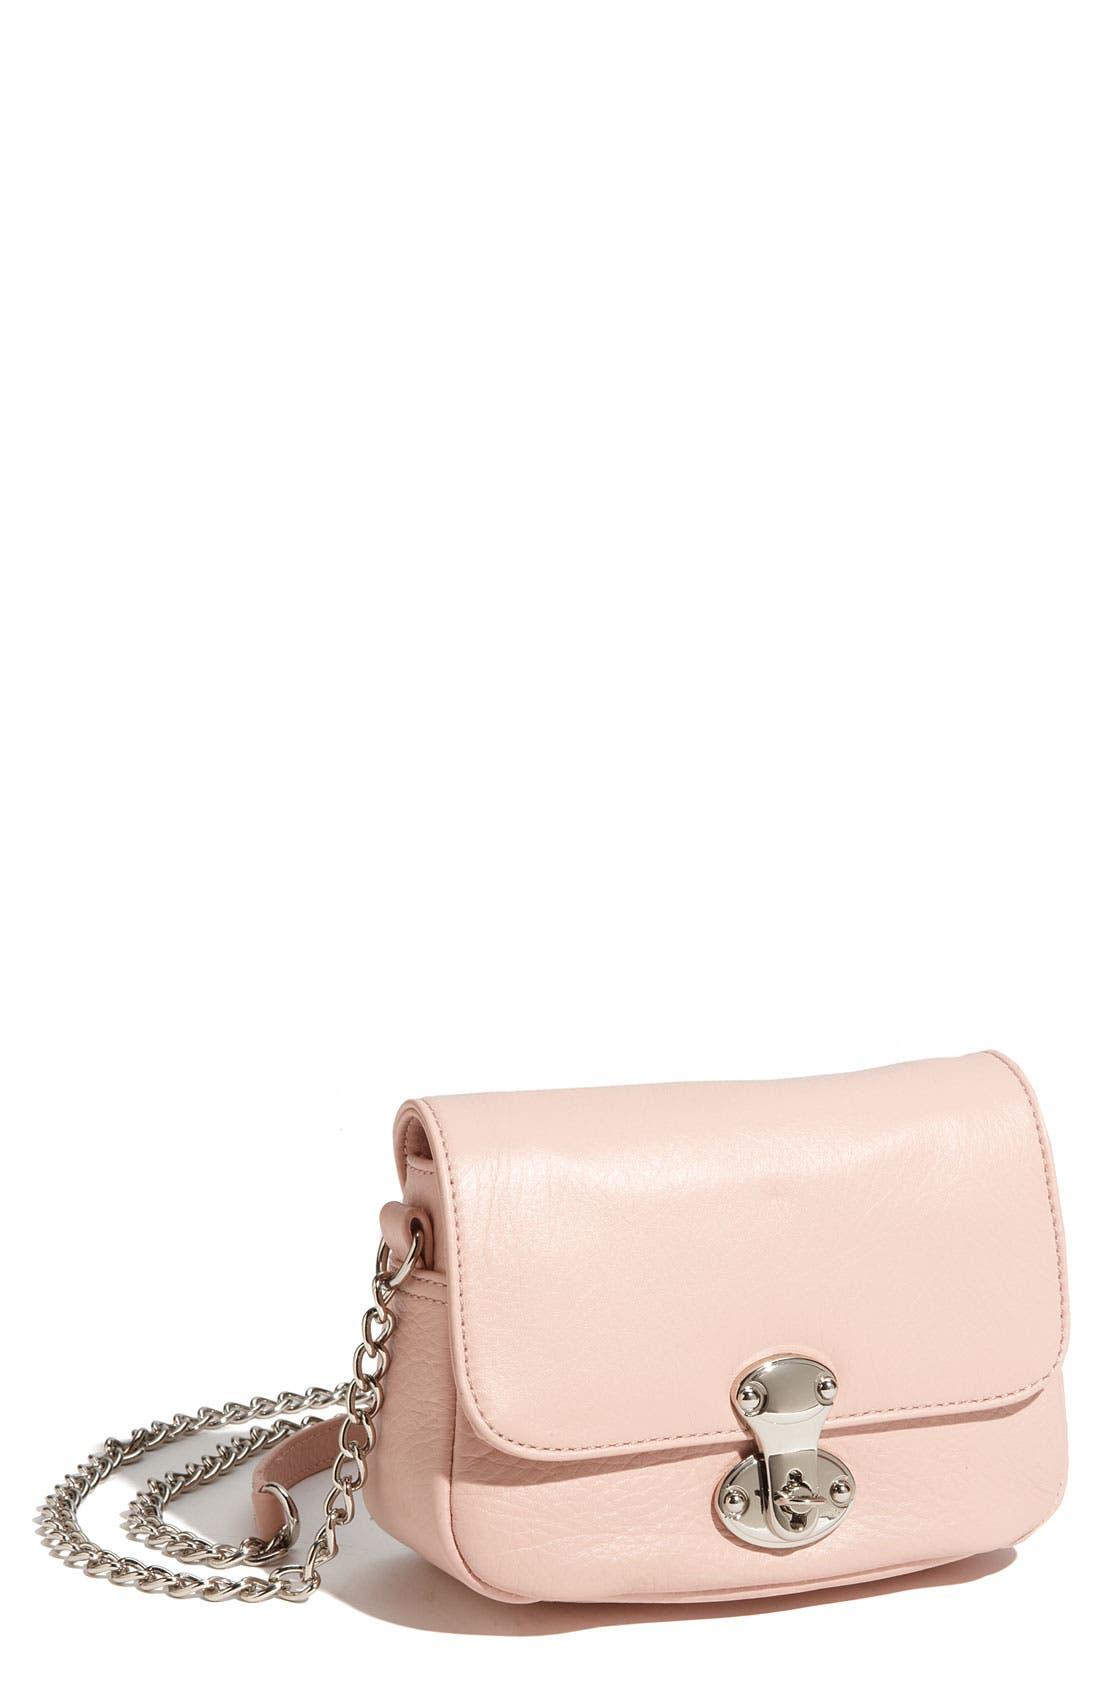 Main Image - Franchi Leather Flap Crossbody Bag